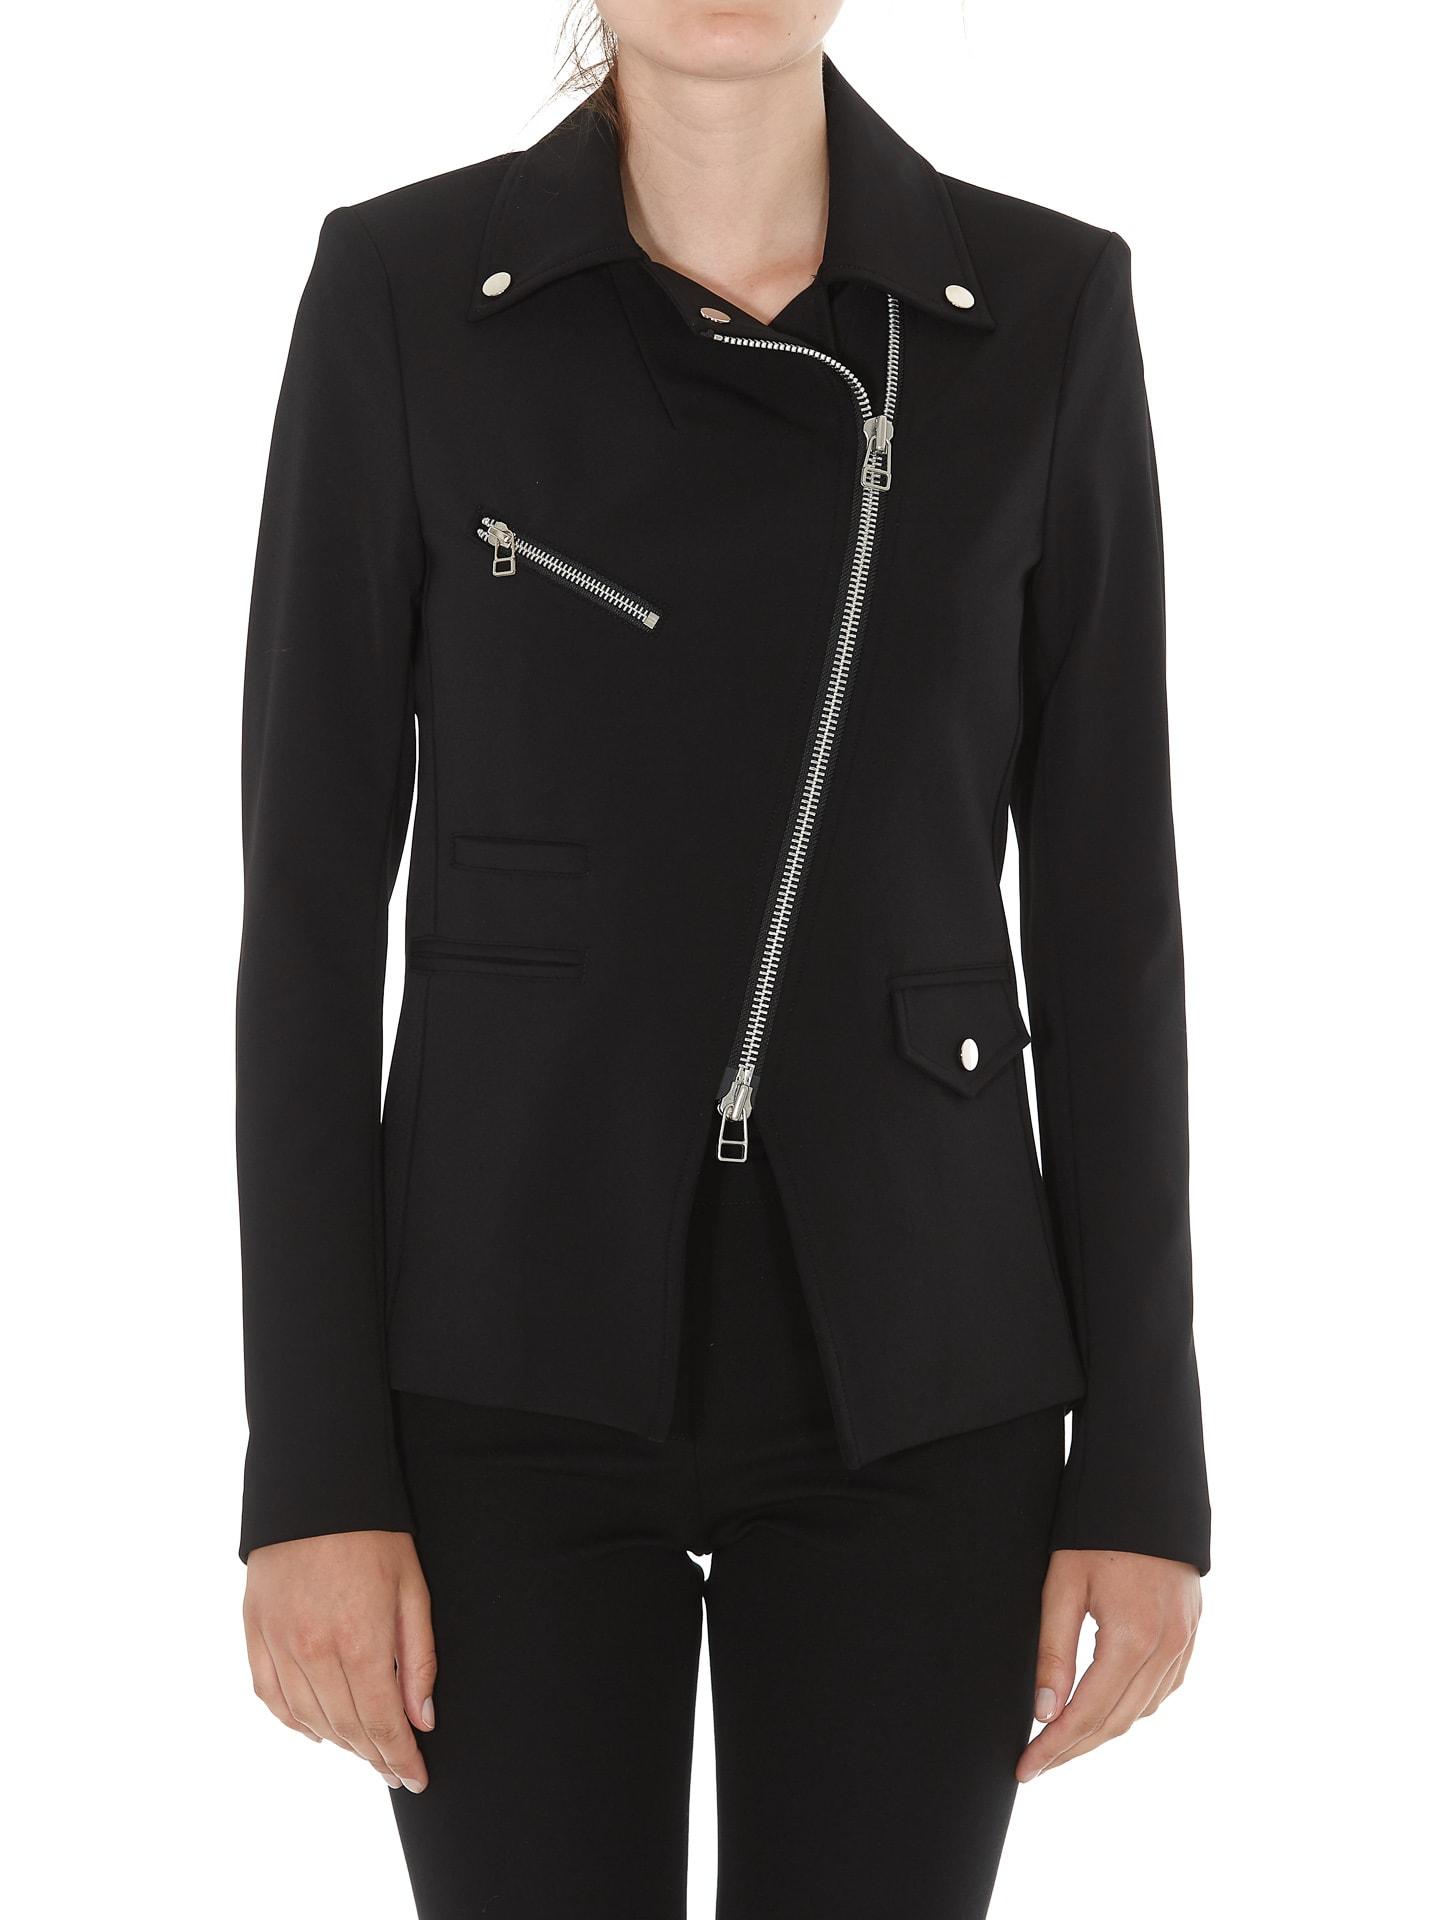 Veronica Beard Biker Jacket